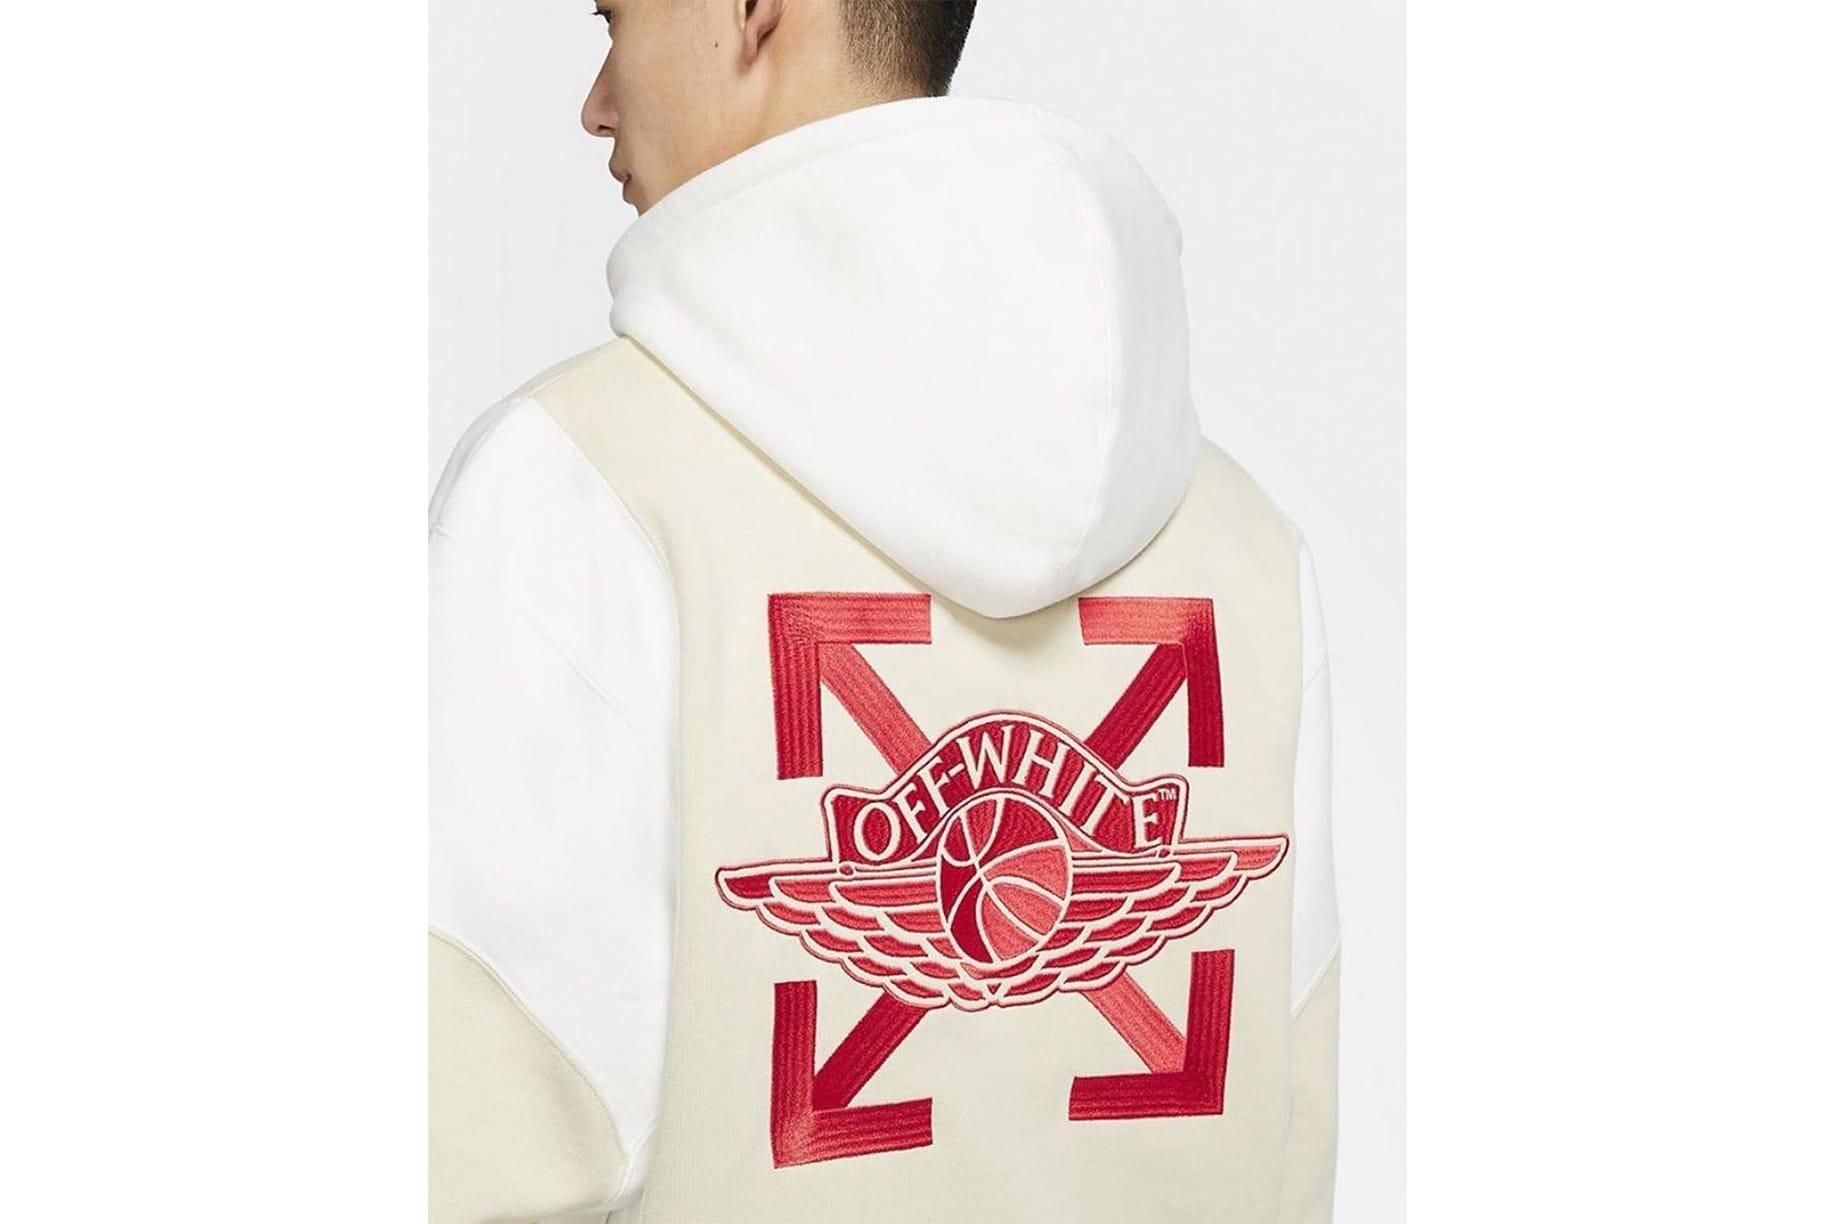 Off-White™ x Jordan Brand Apparel